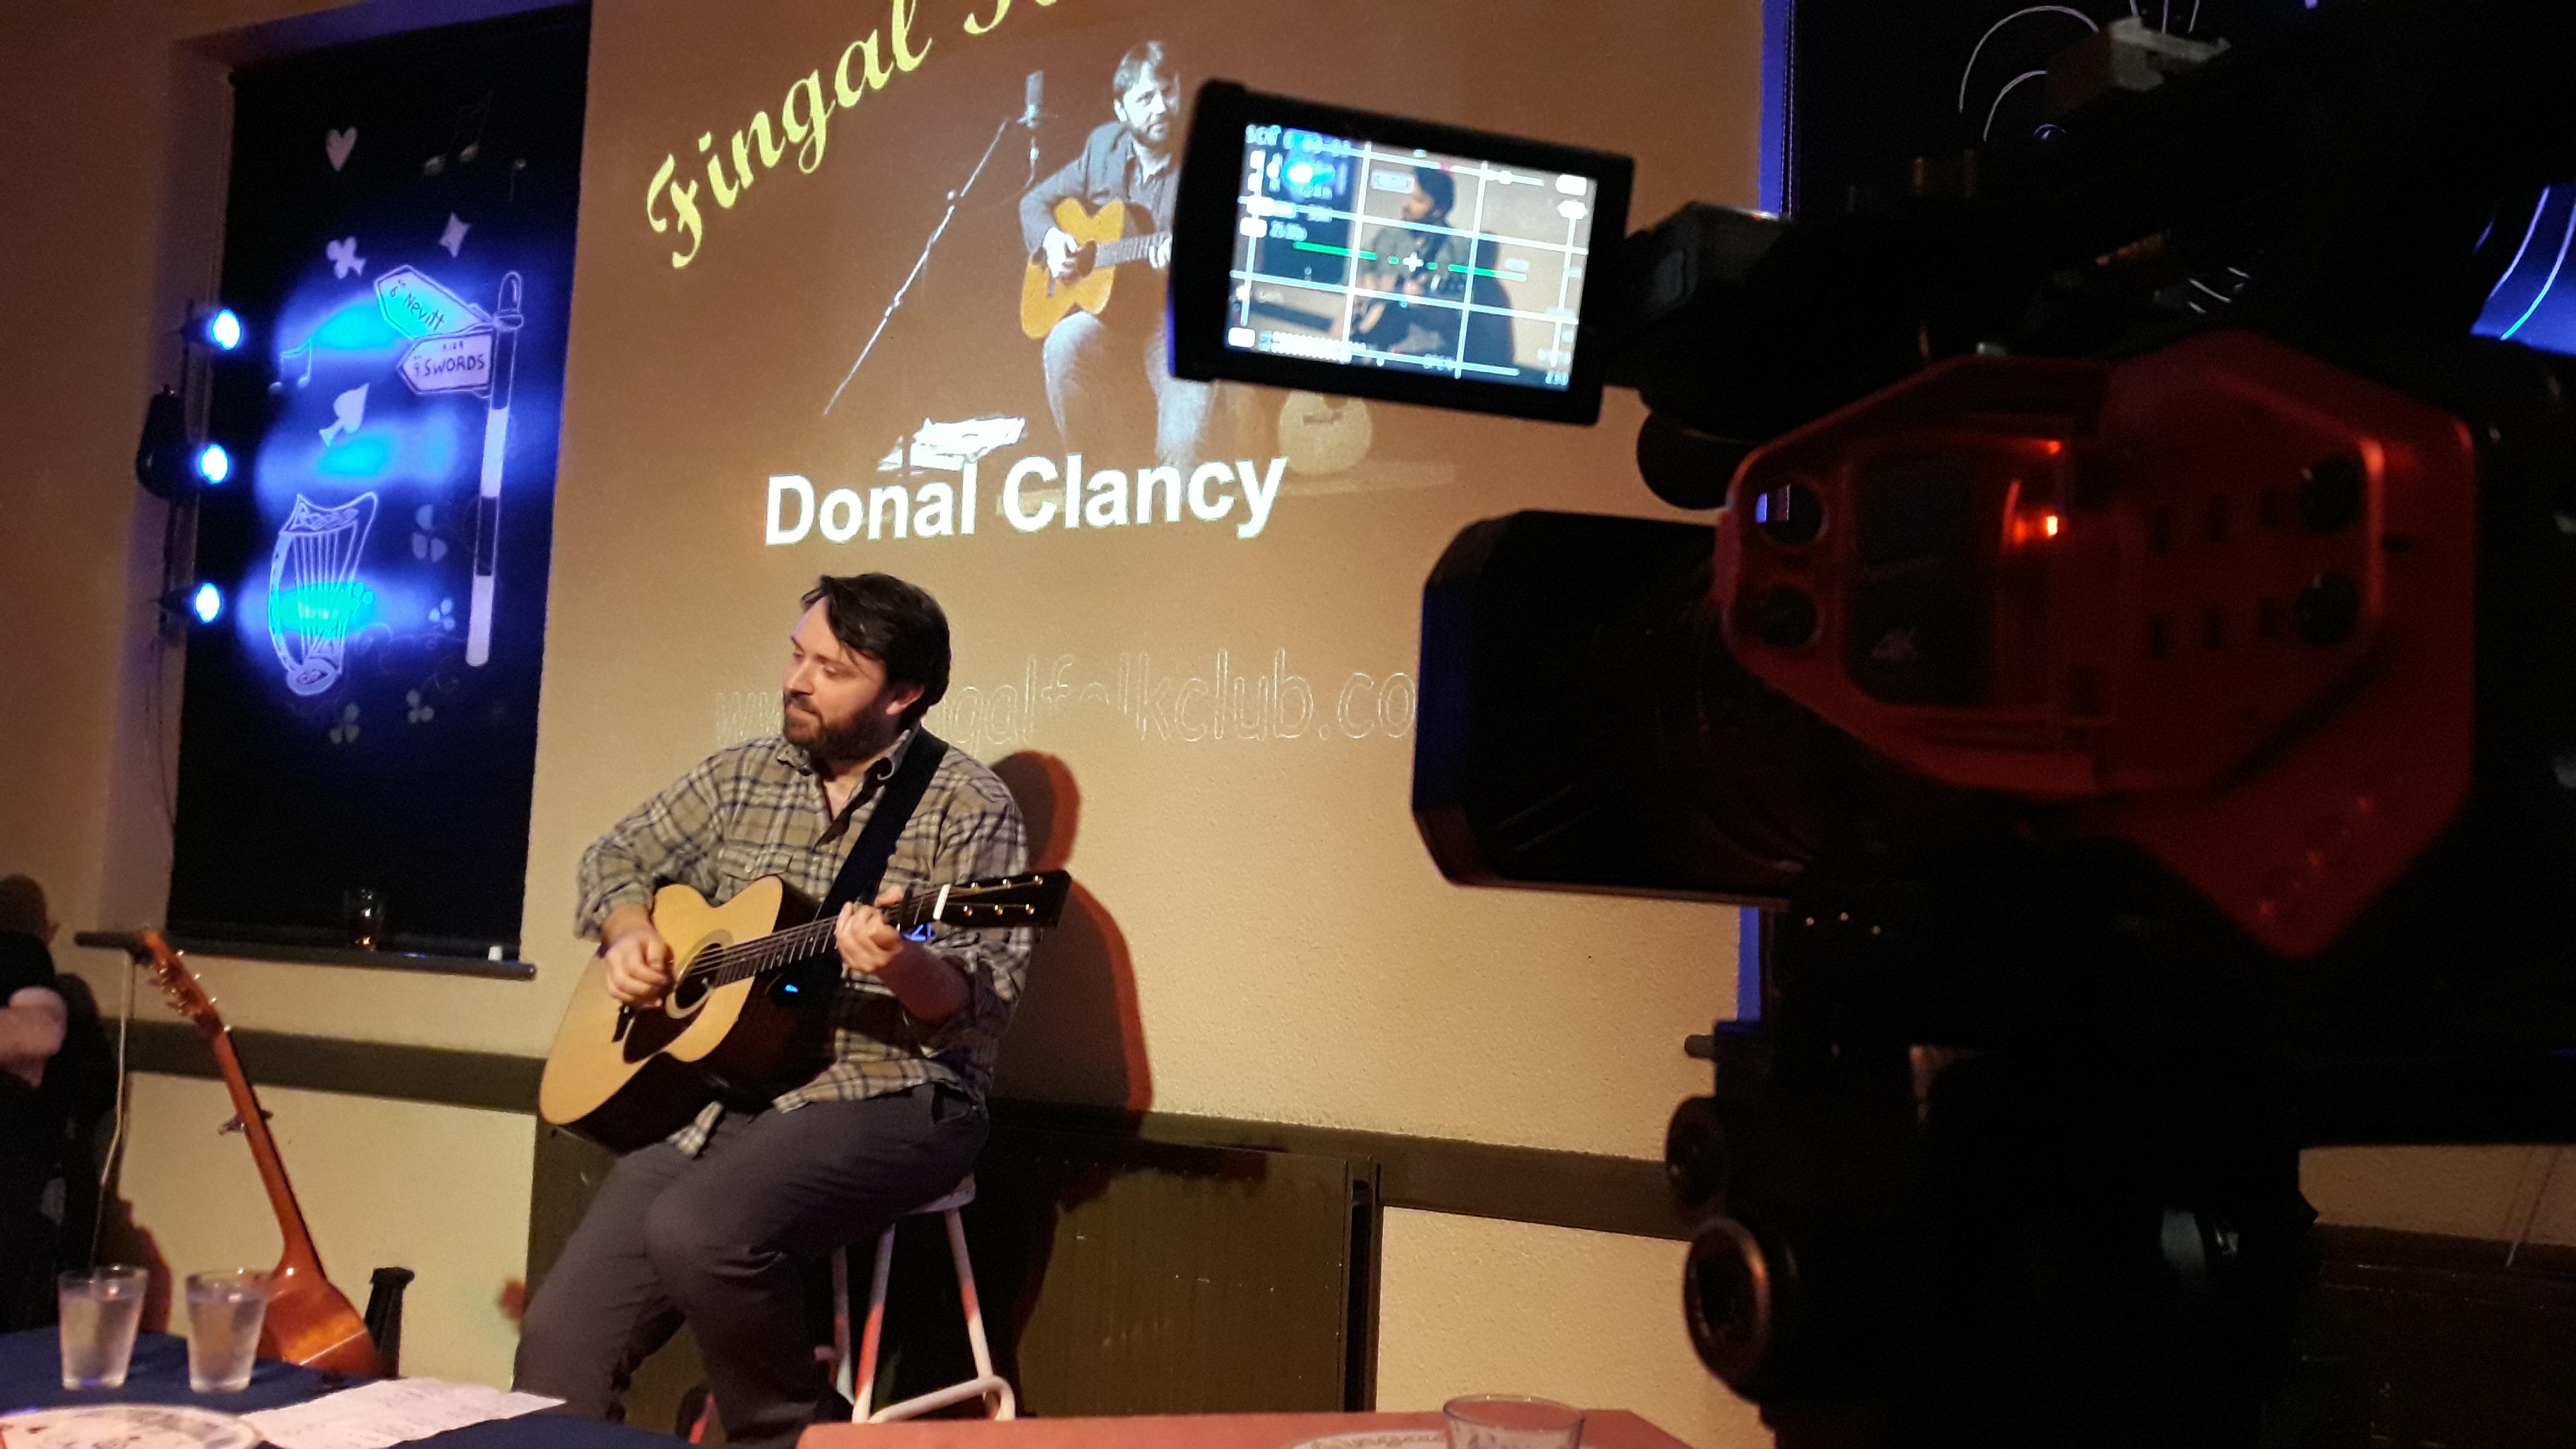 Donal CLancy LCD DVX 200